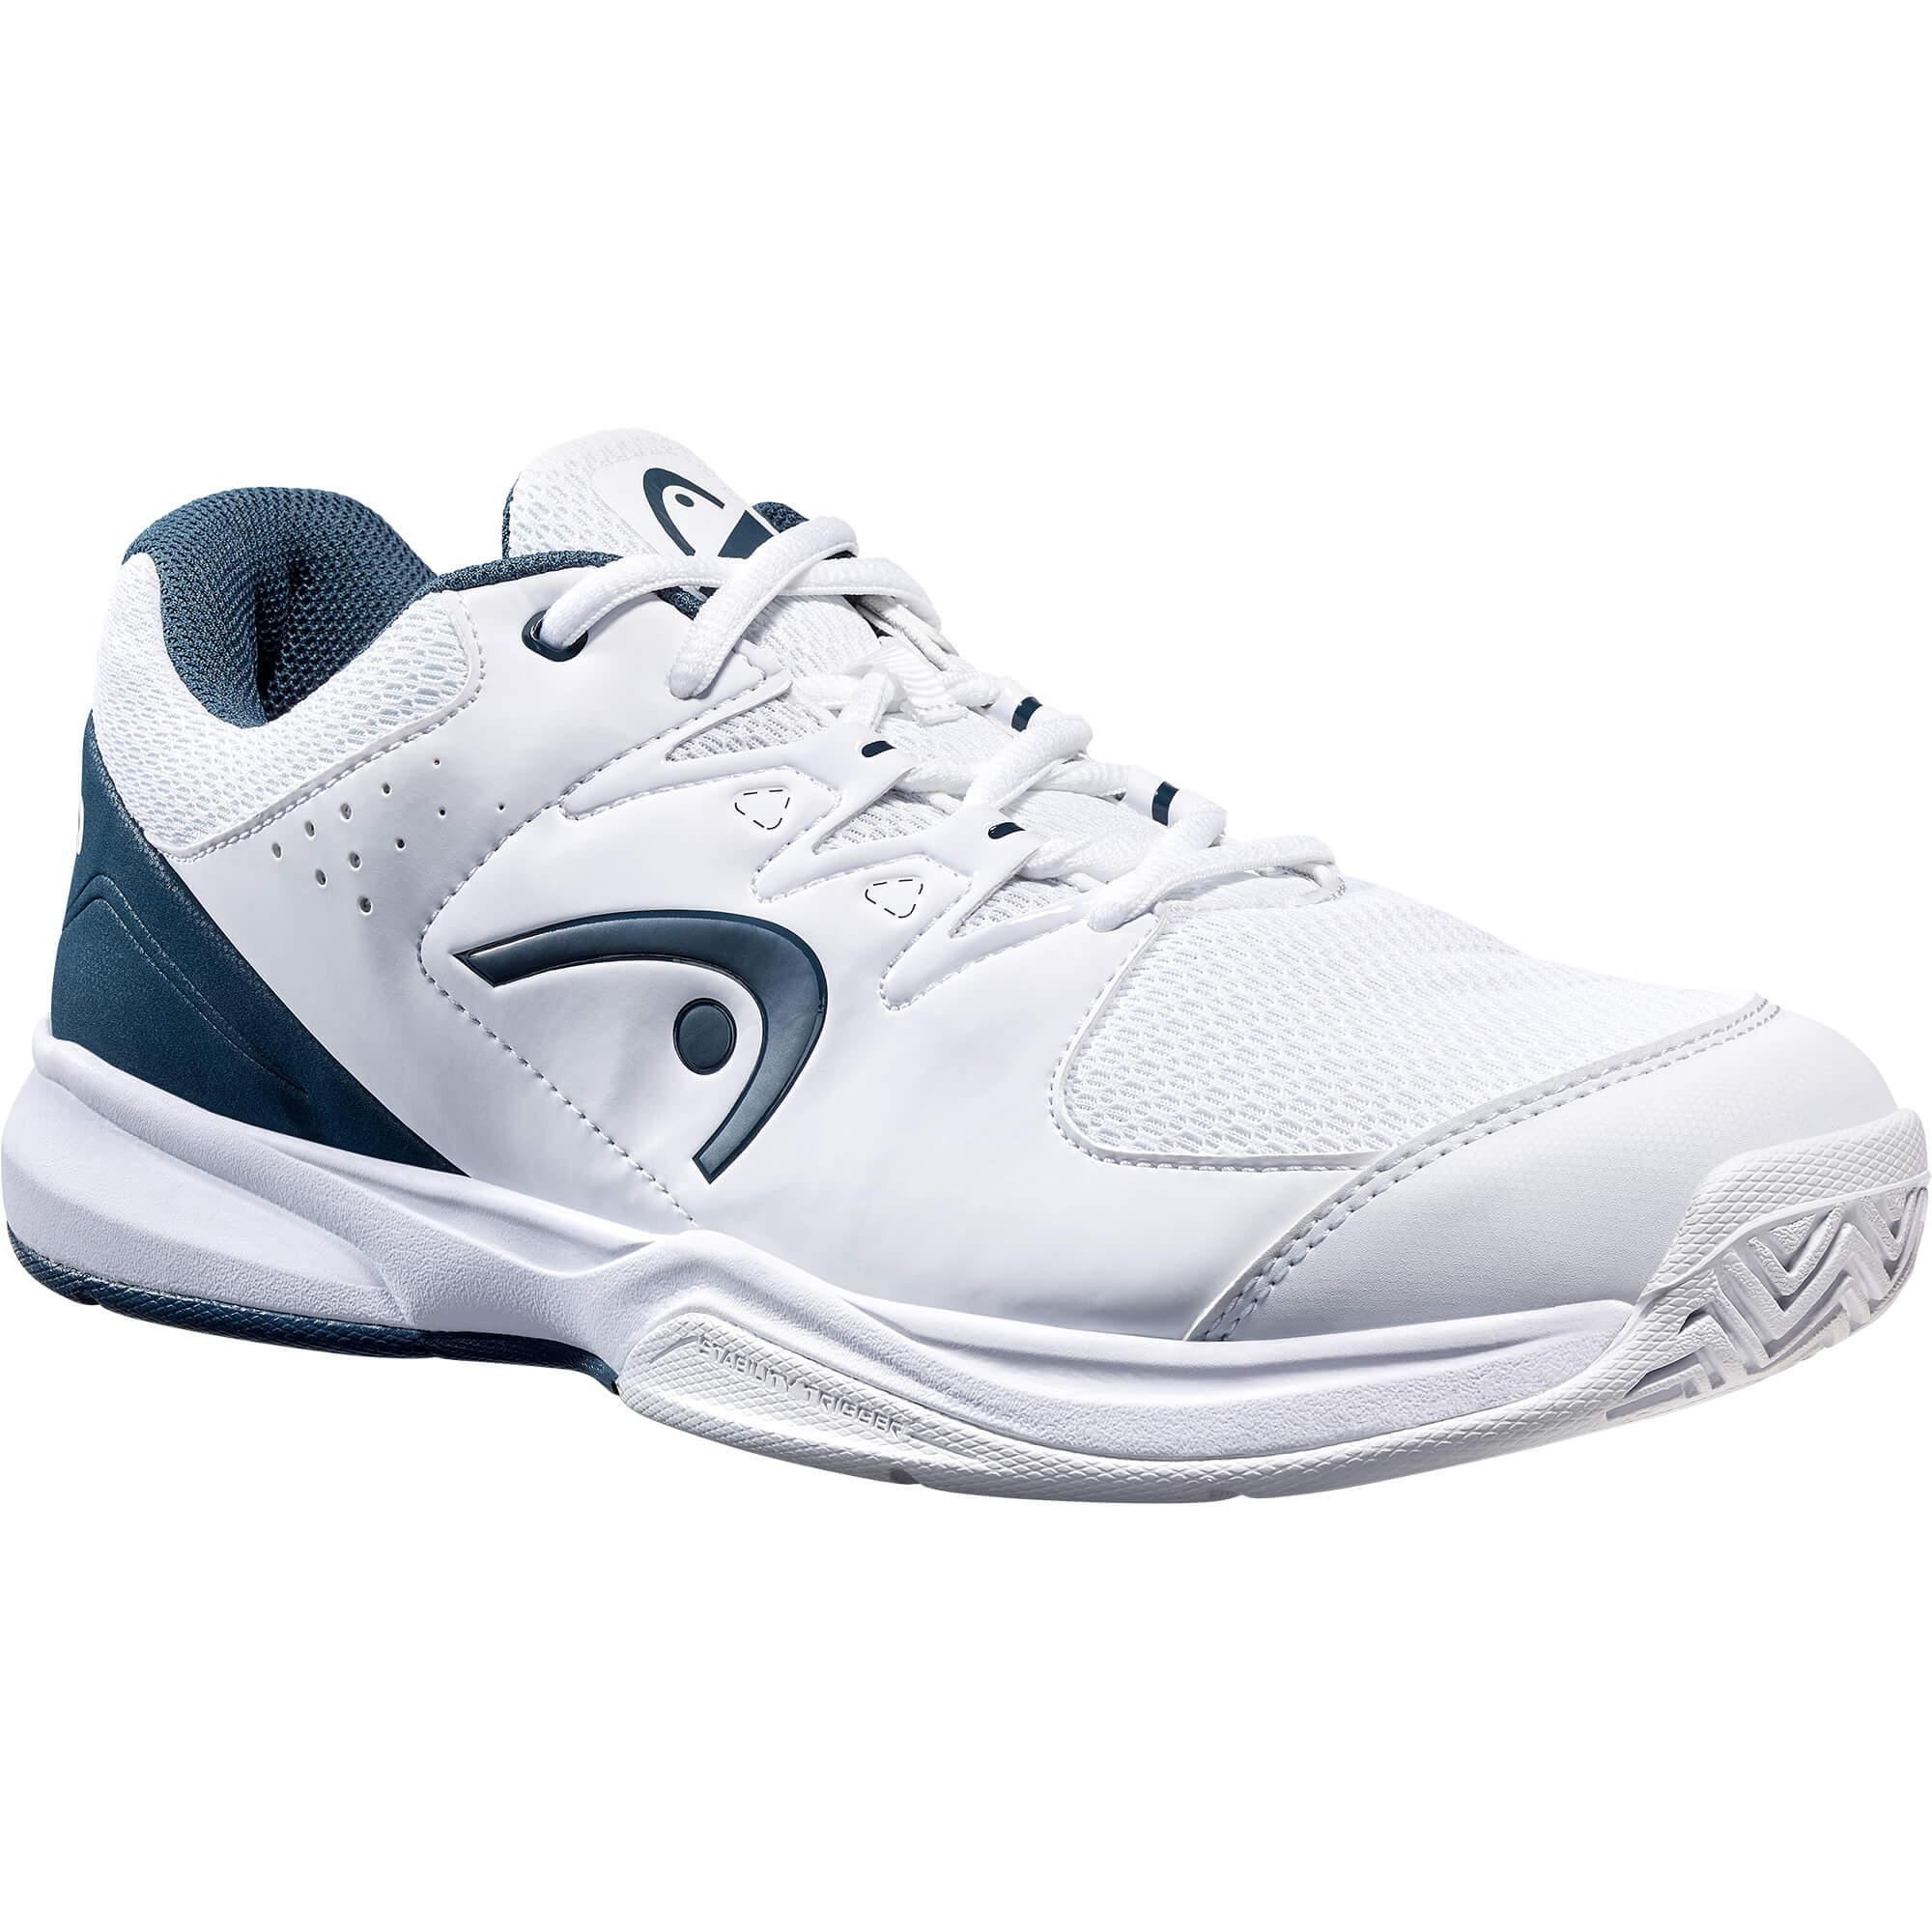 Head Mens Brazer 2.0 Tennis Shoes